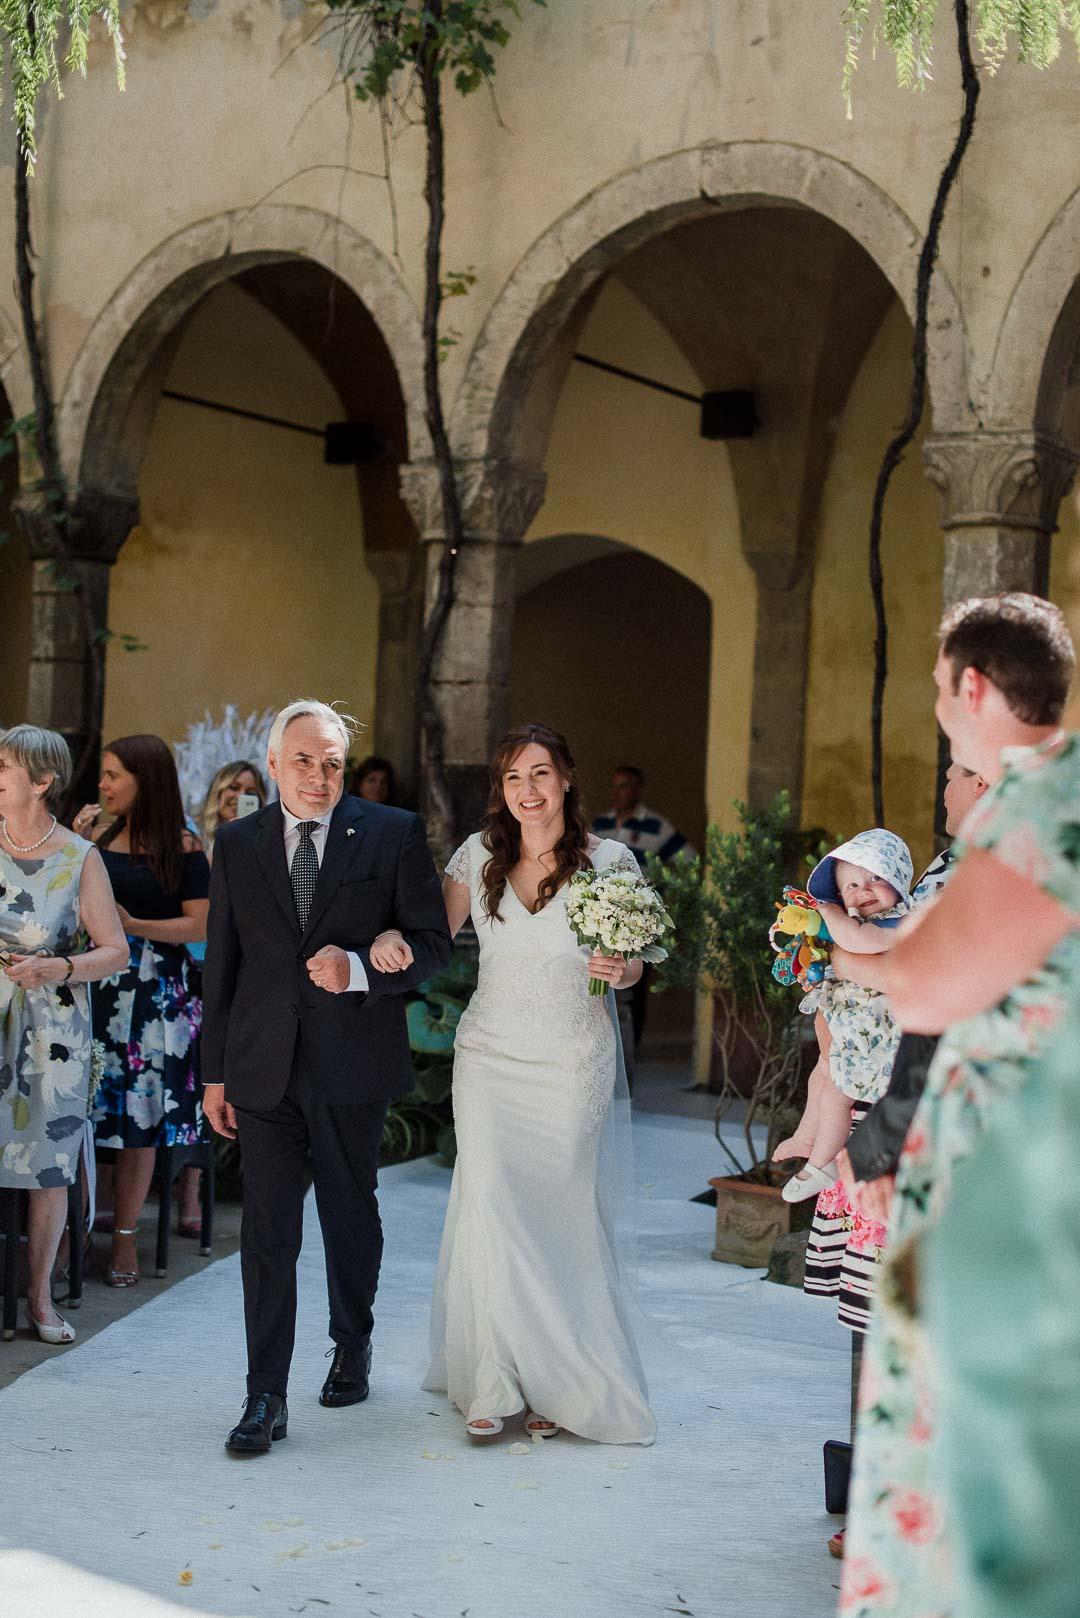 wedding-photographer-destination-fineart-bespoke-reportage-sorrento-parcodeiprincipi-vivianeizzo-spazio46-36